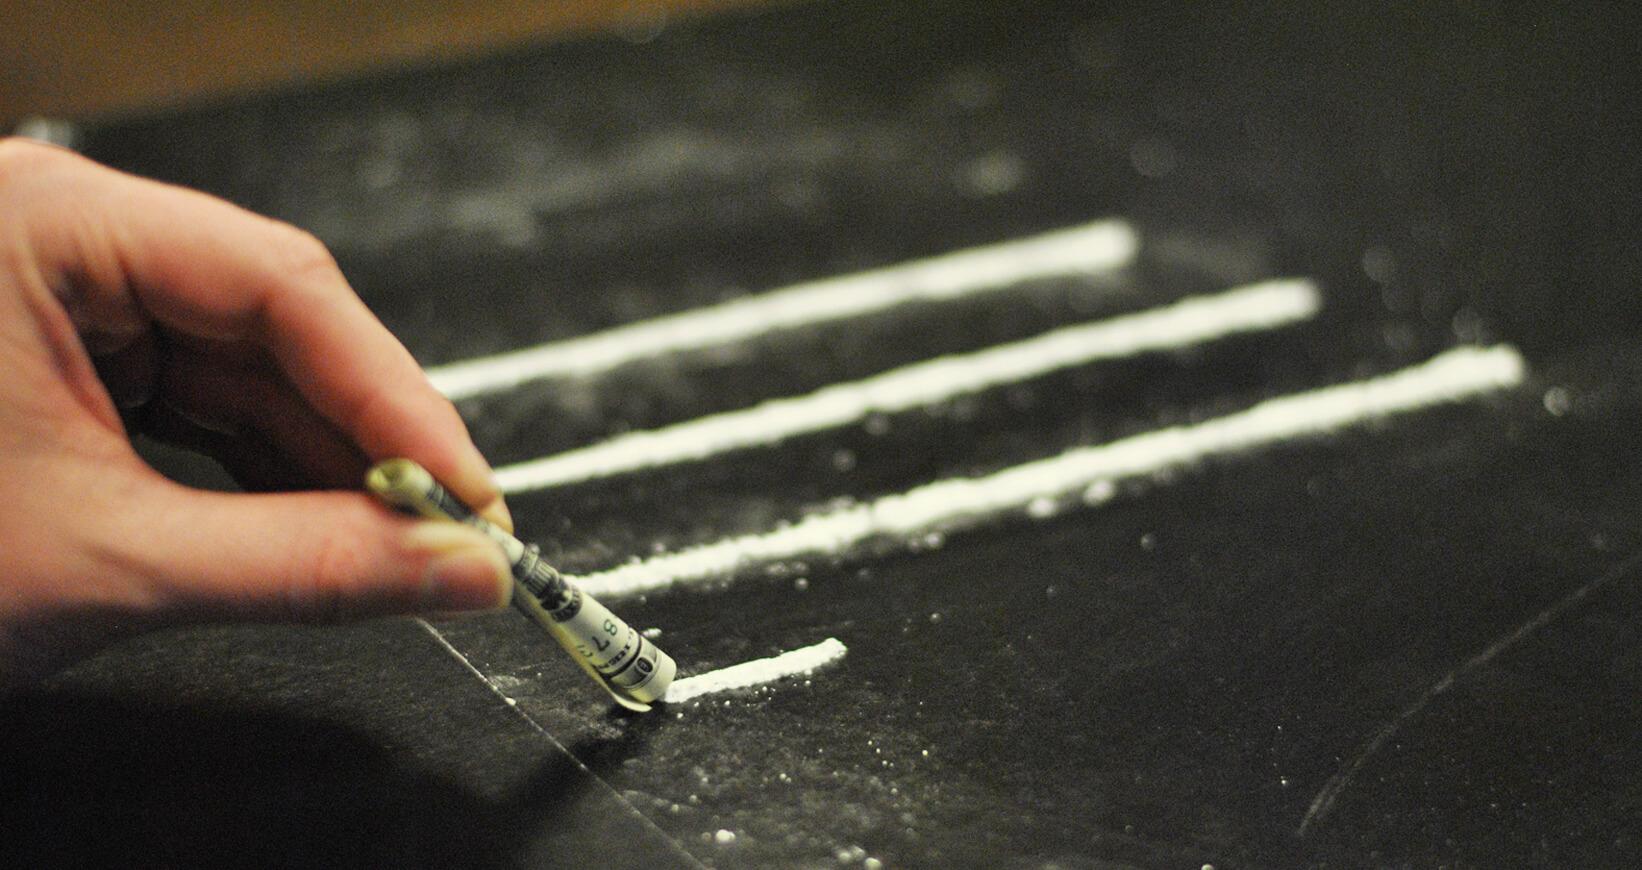 NJ Cocaine Possession Lawyer near me